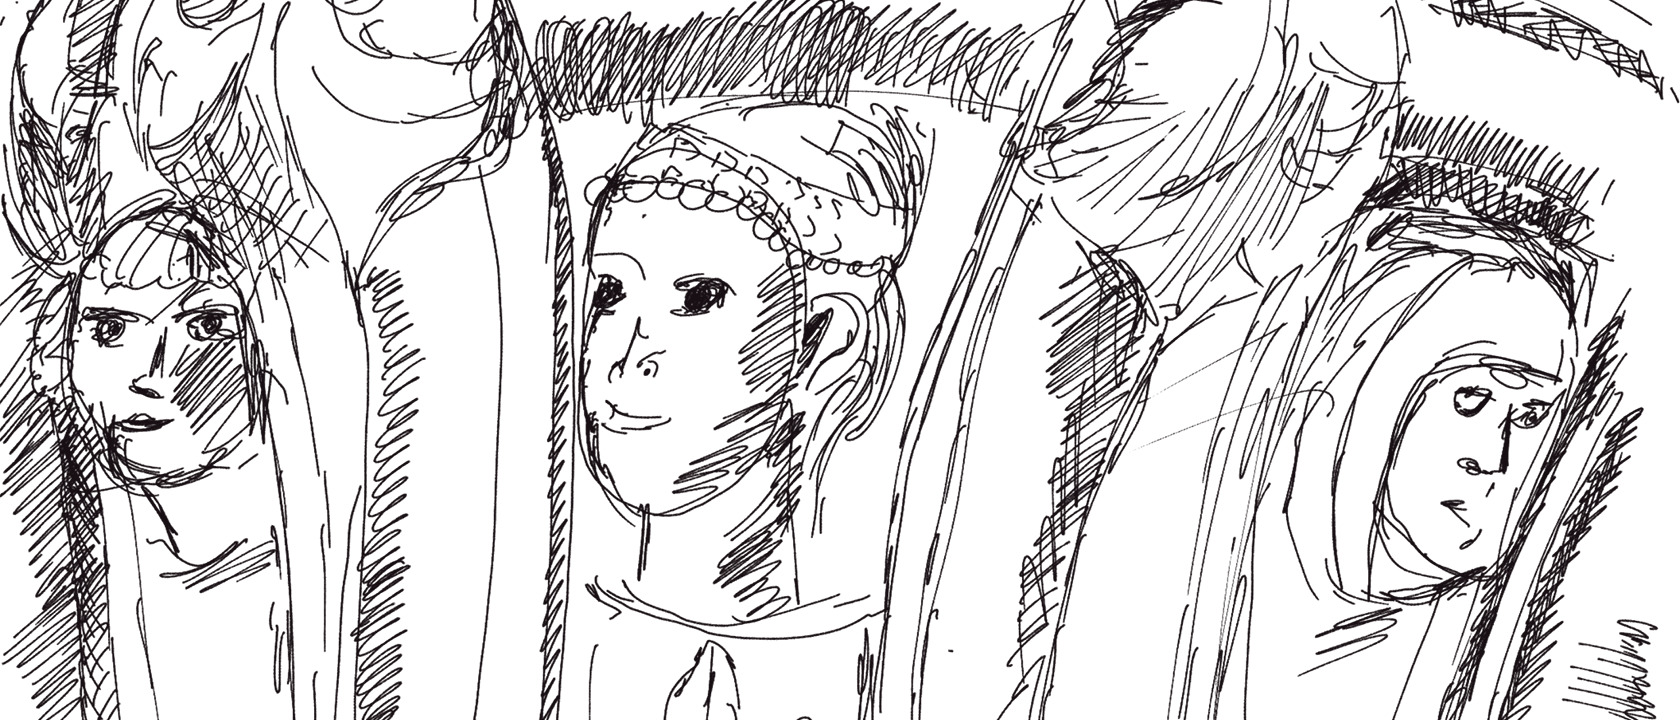 Bleistiftskizze eines Kapitells am Dogenpalast